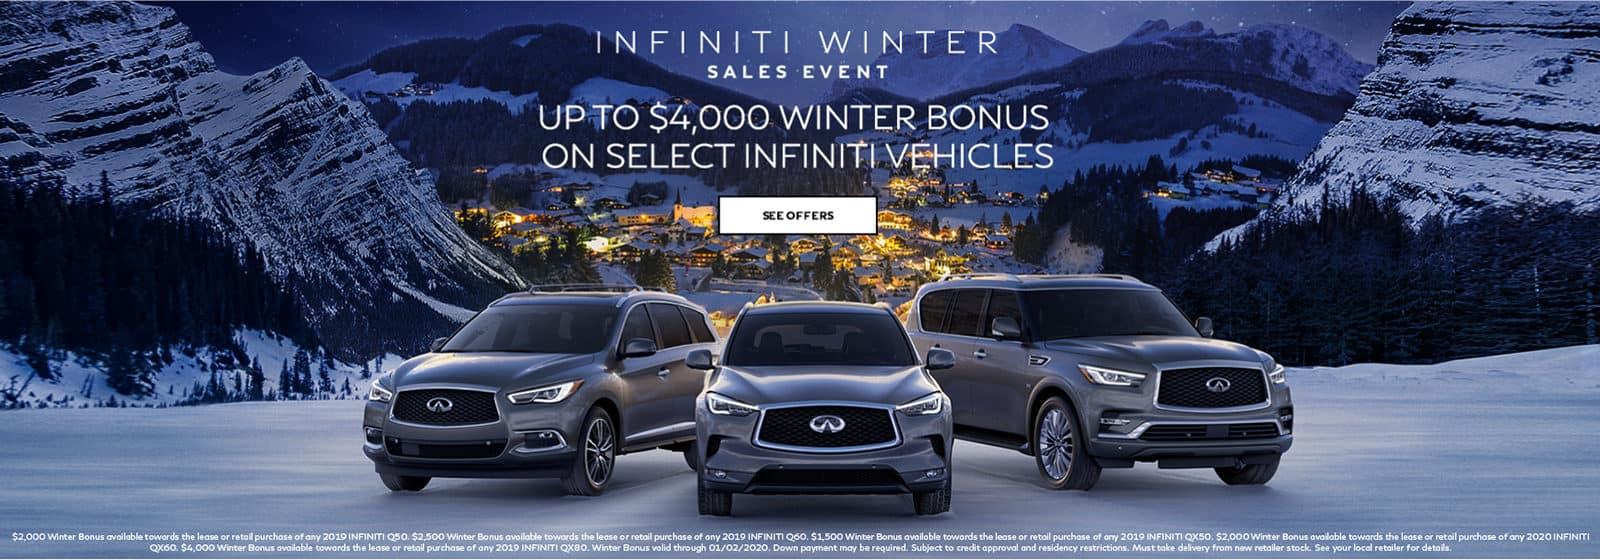 Winter Sales Event 2019